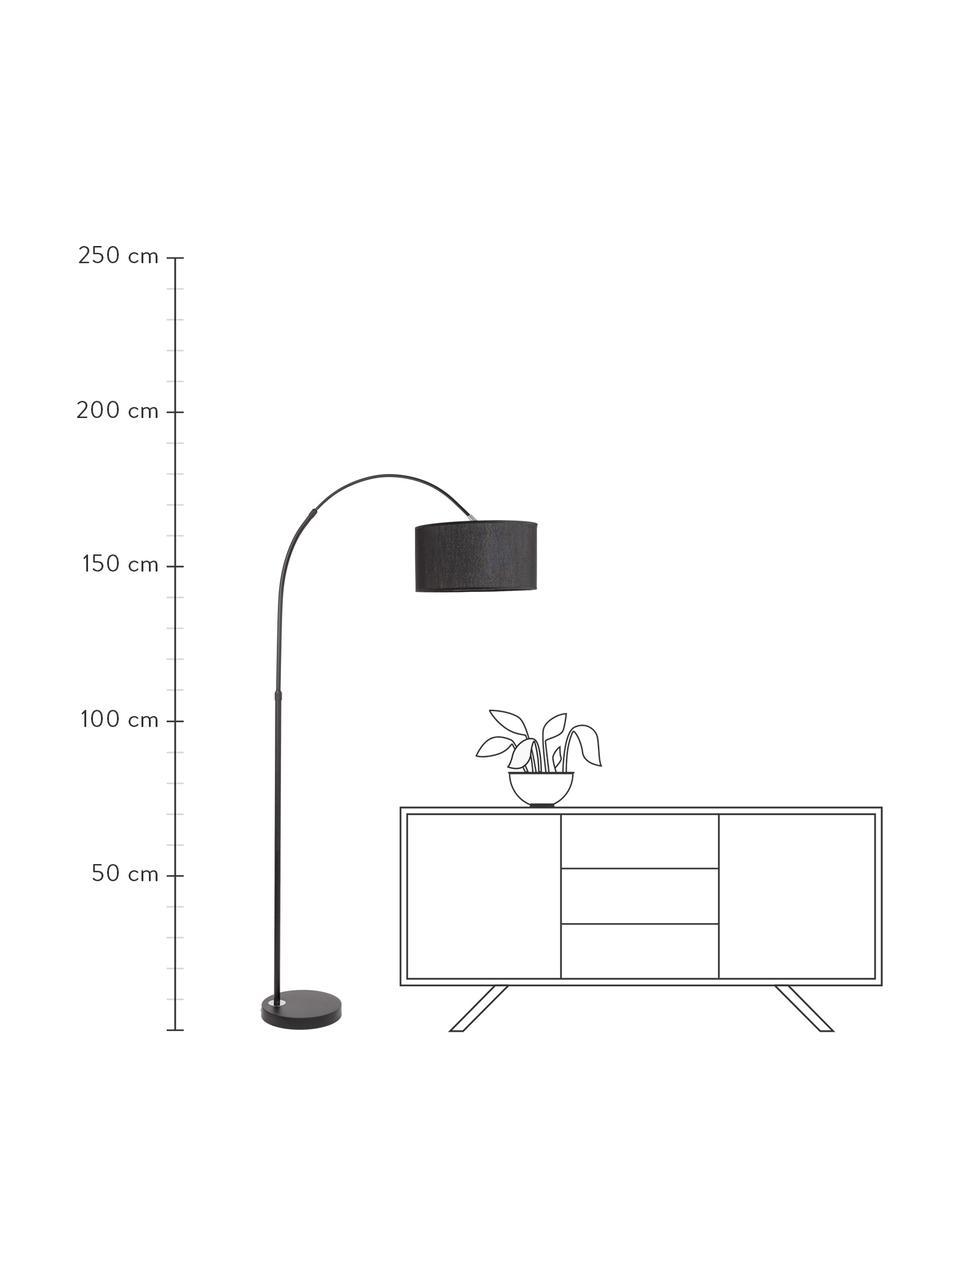 Bogenlampe Sama in Schwarz, Lampenschirm: Textil, Lampenfuß: Aluminium, Black, 90 x 180 cm